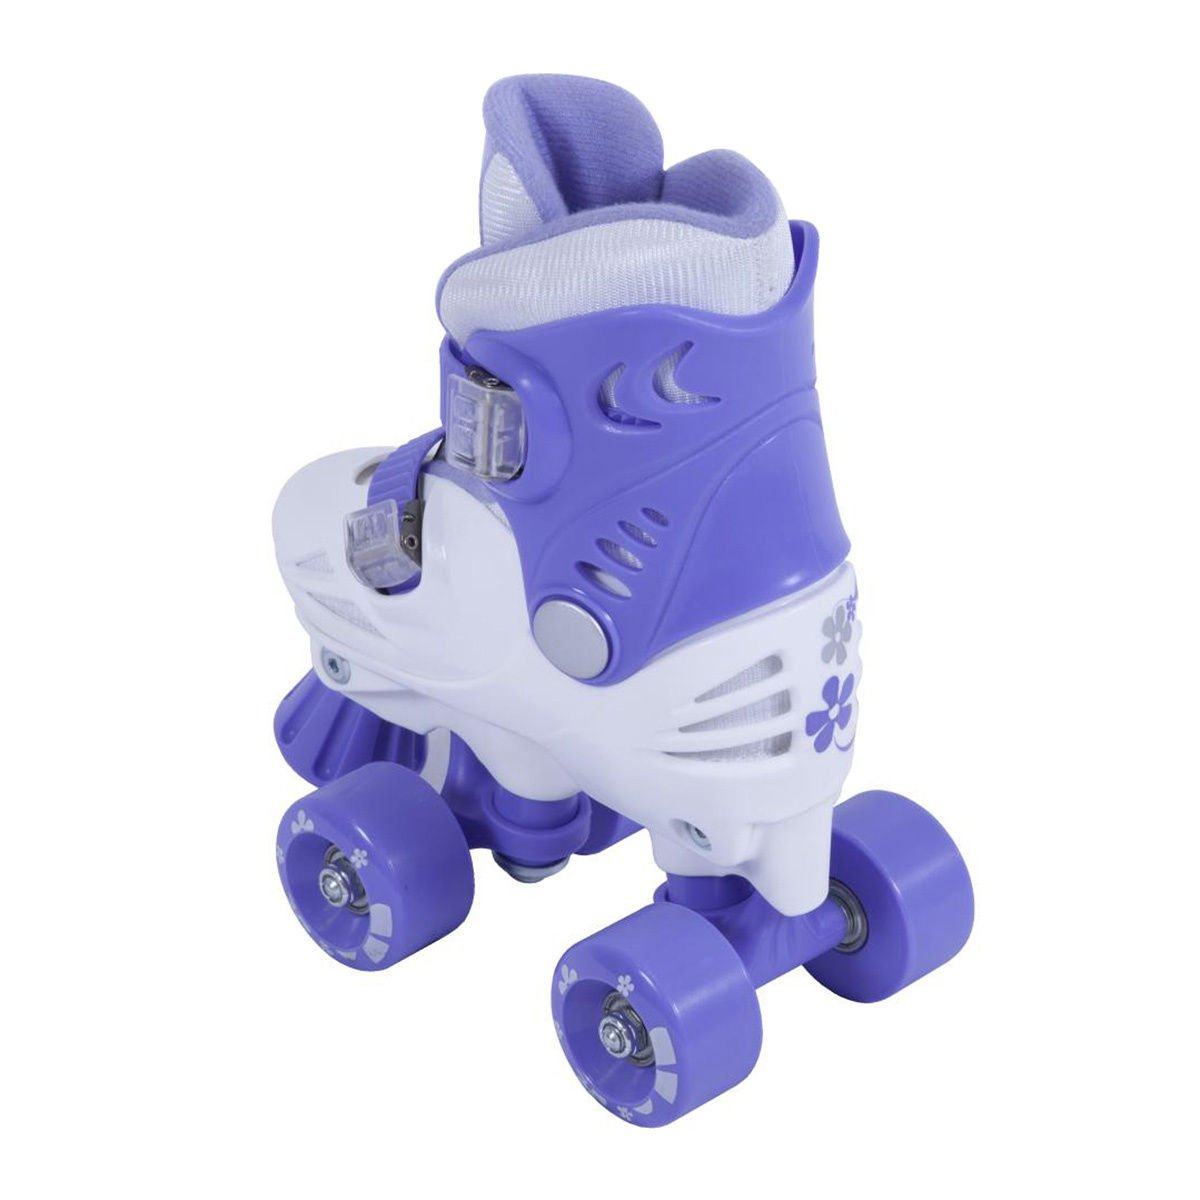 Rookie roller skates amazon - Rookie Bliss Junior Adjustable Roller Skates White Purple Amazon Co Uk Sports Outdoors